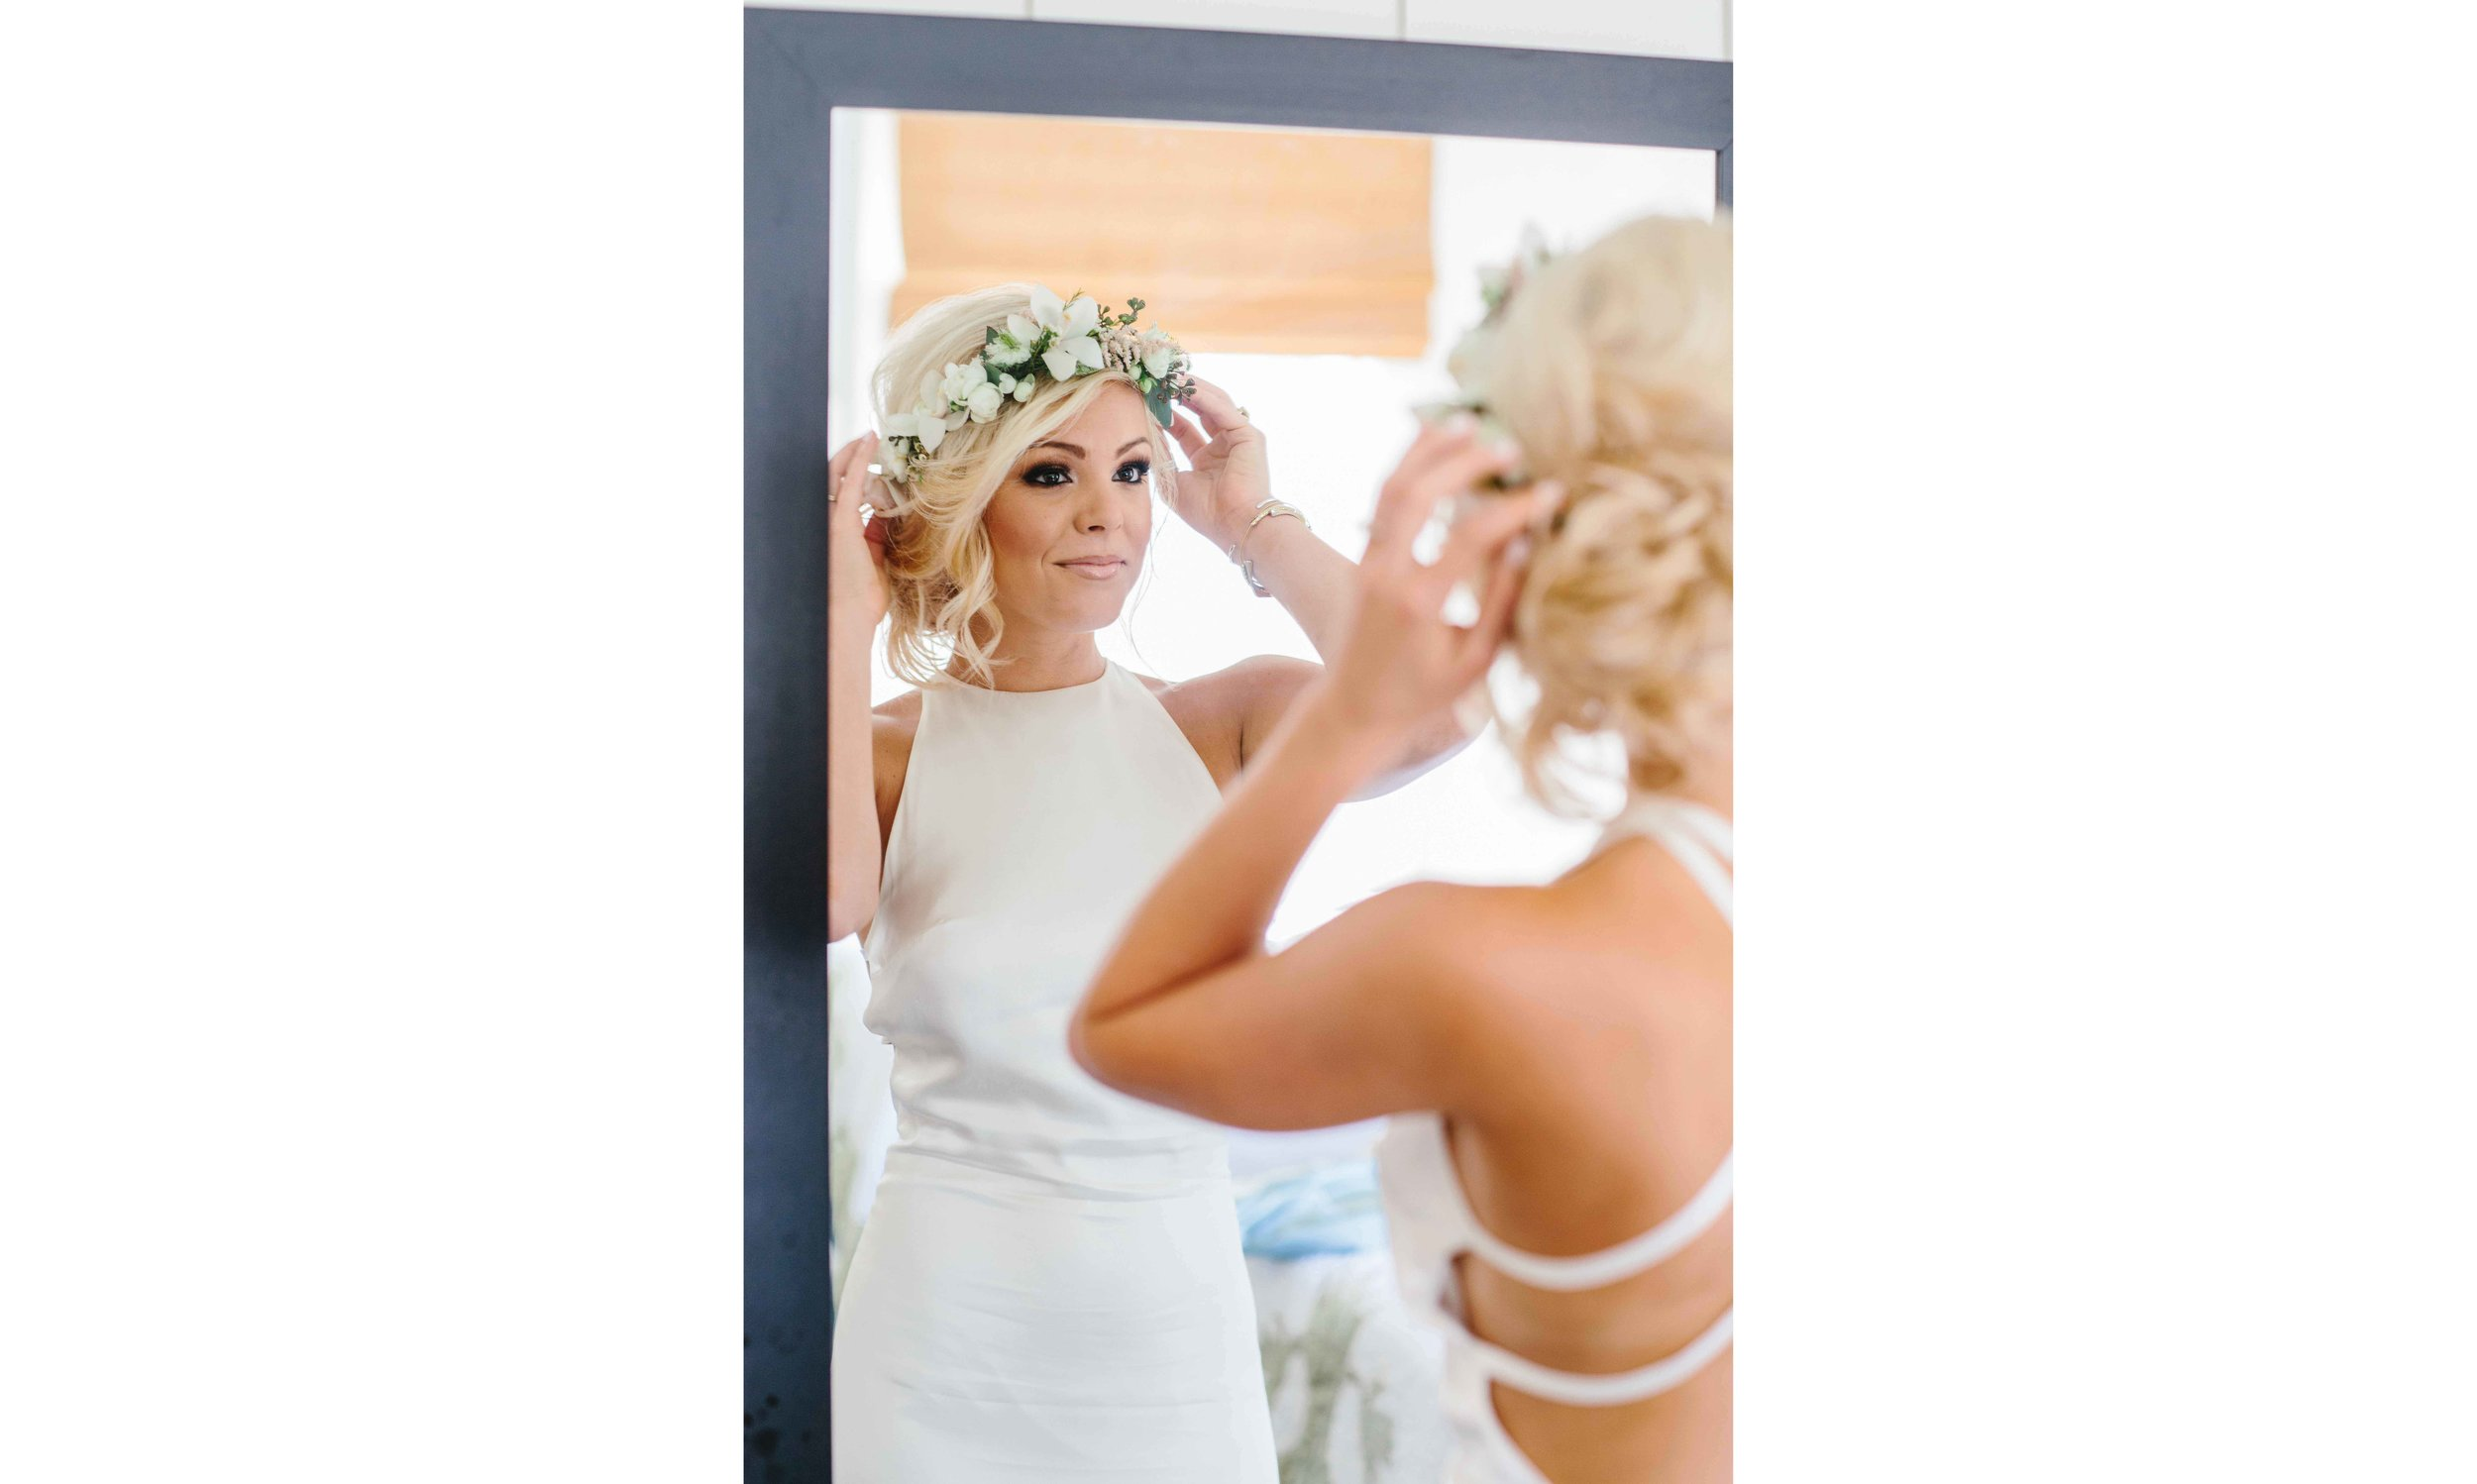 Hawaii Bride Before Ceremony Photo